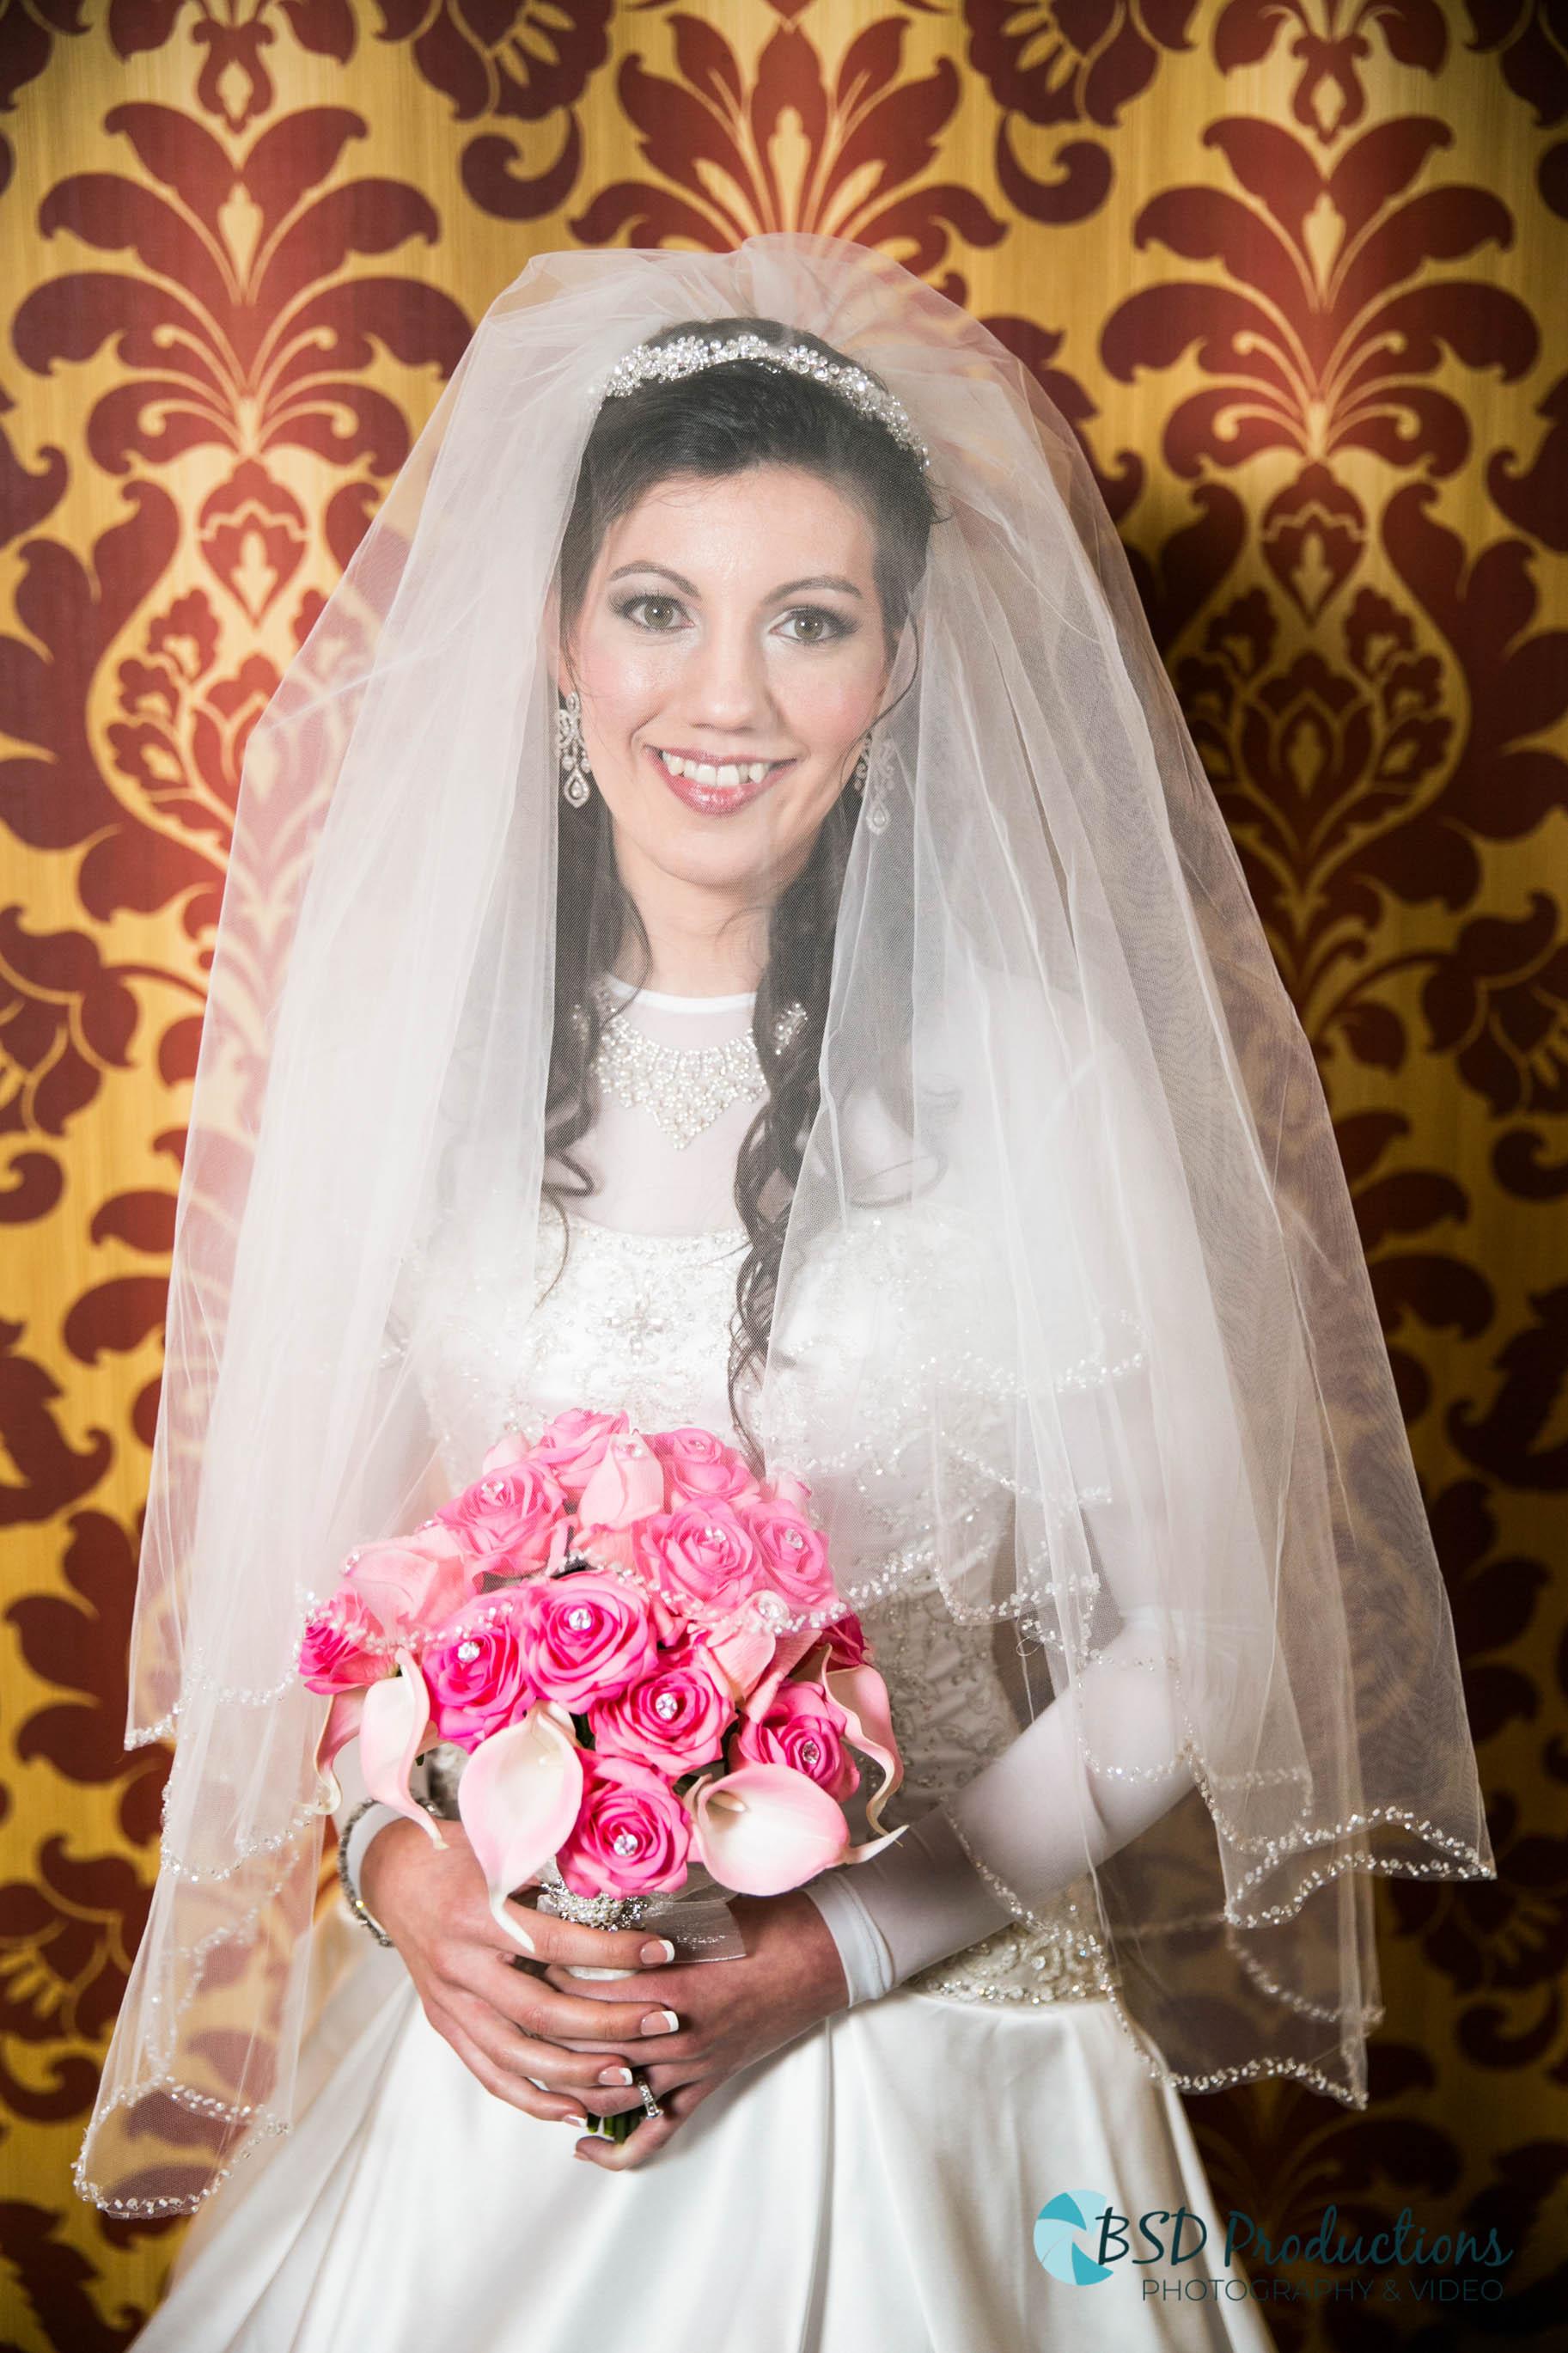 D_R_9823 Wedding – BSD Productions Photography